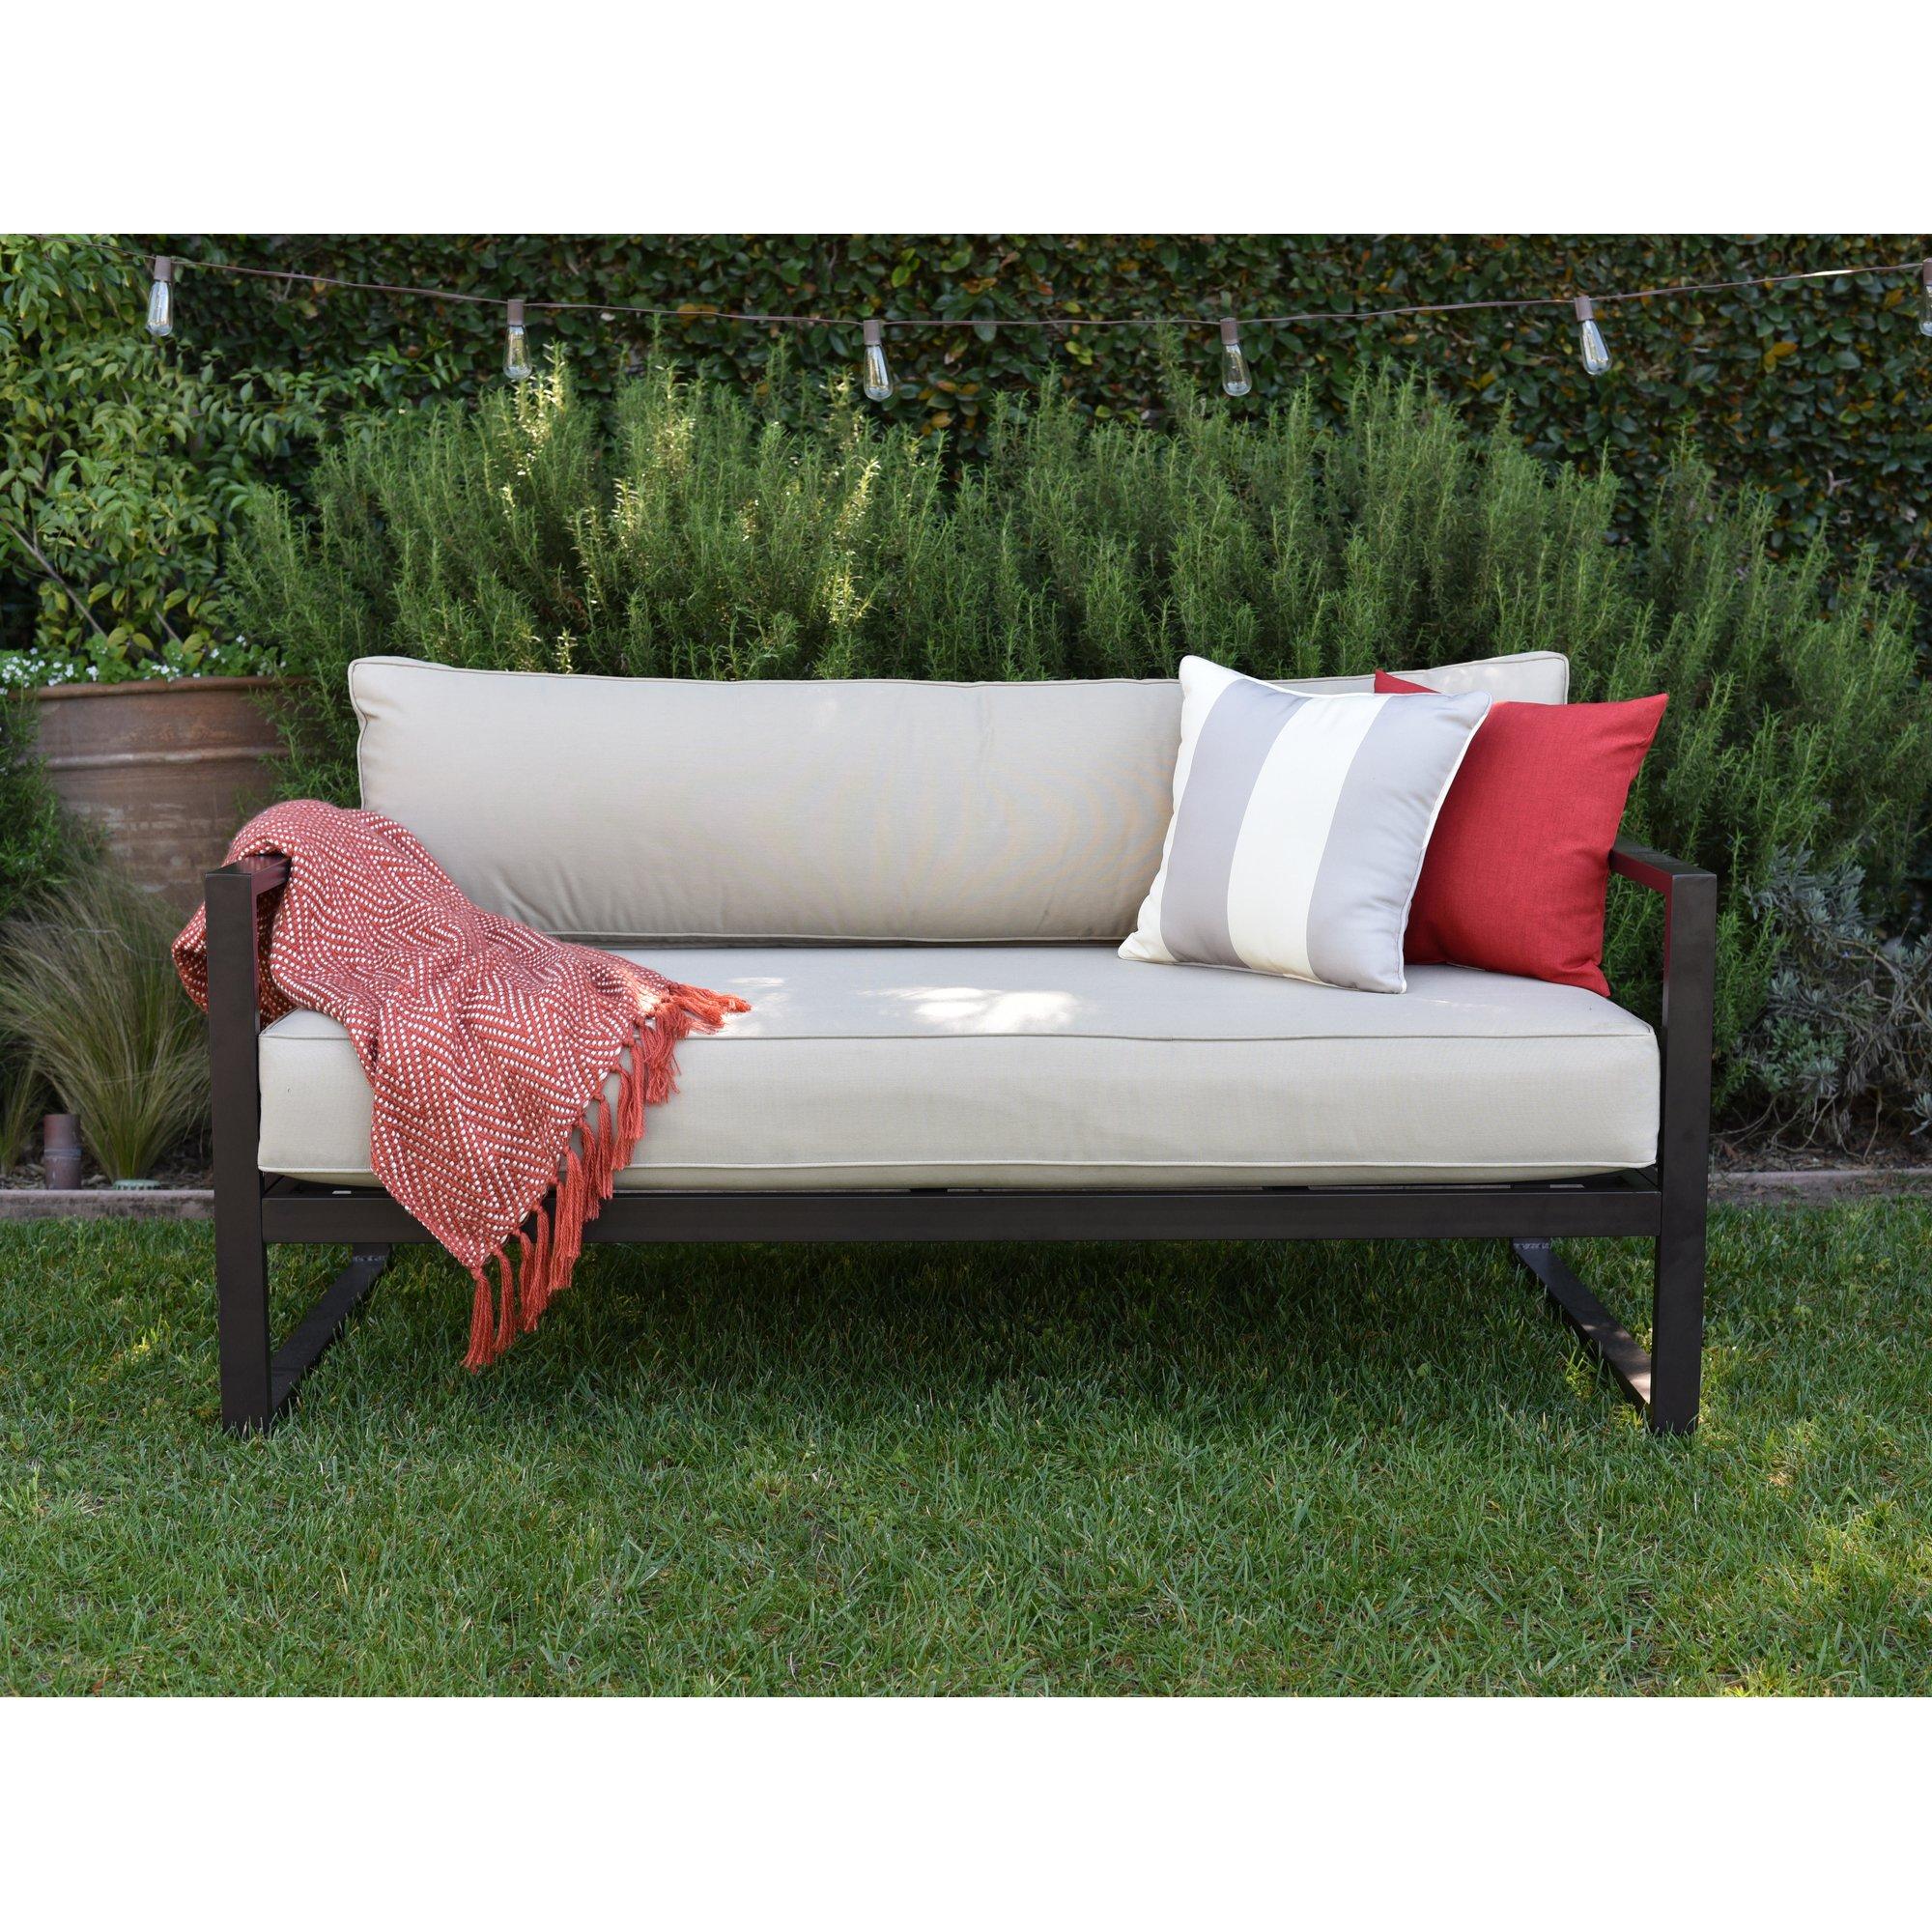 catalina outdoor sofa with cushions FGEHUGP